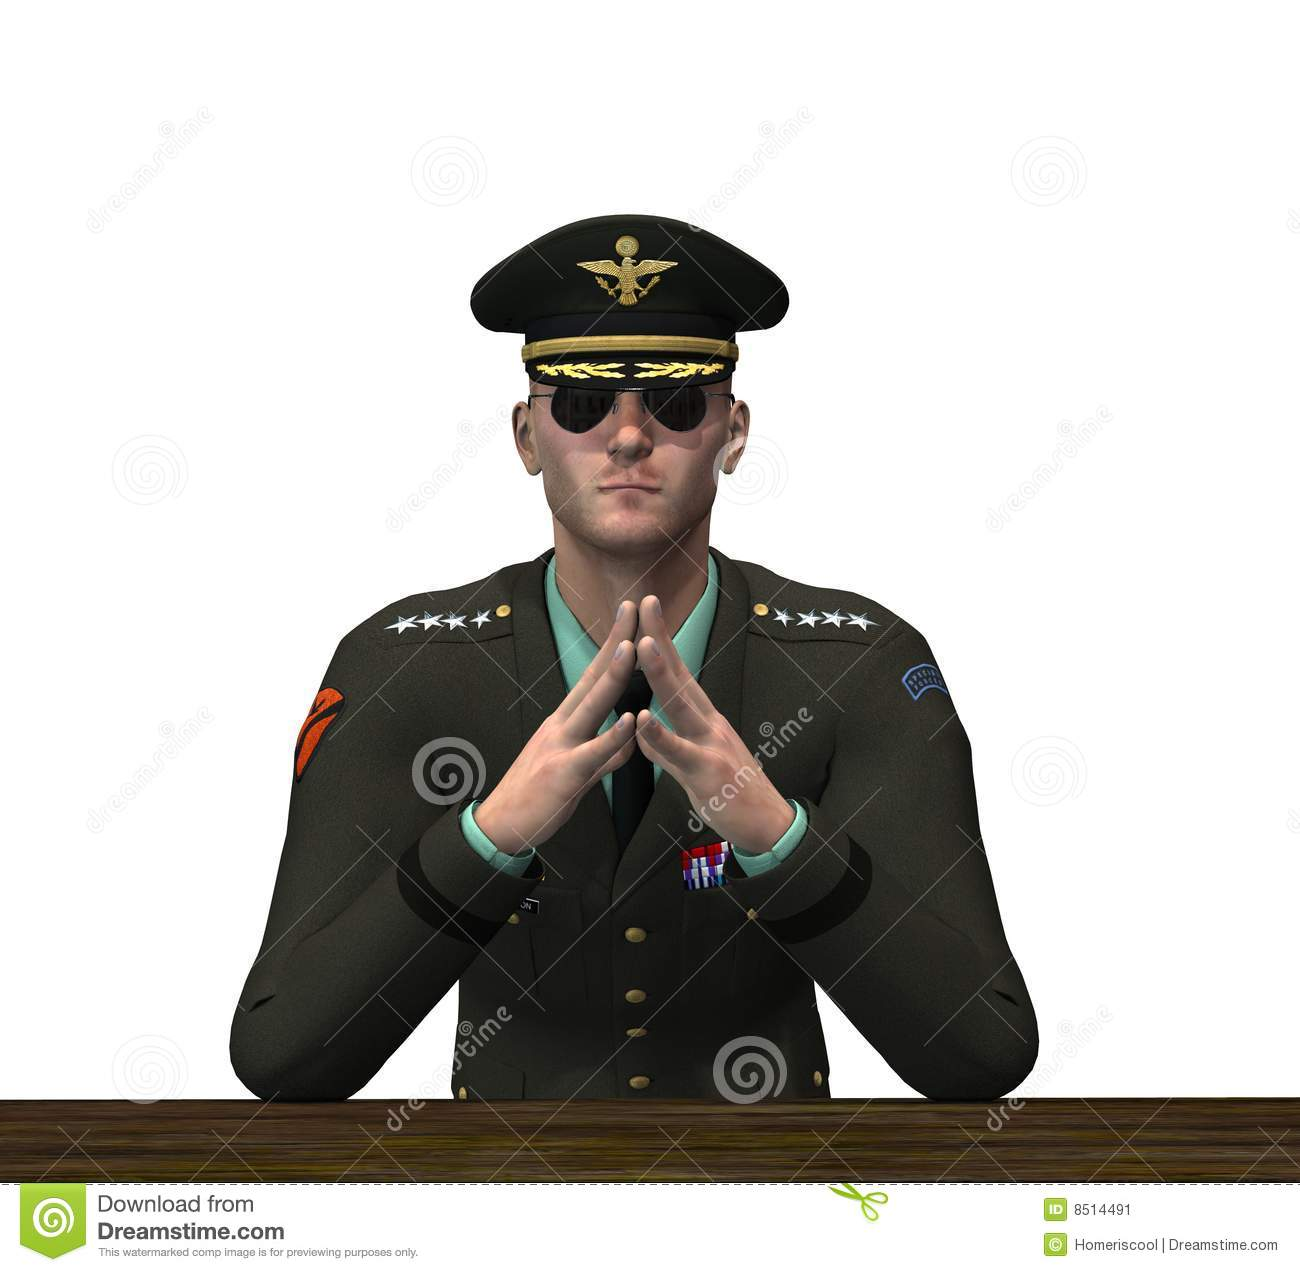 Army colonel clipart.